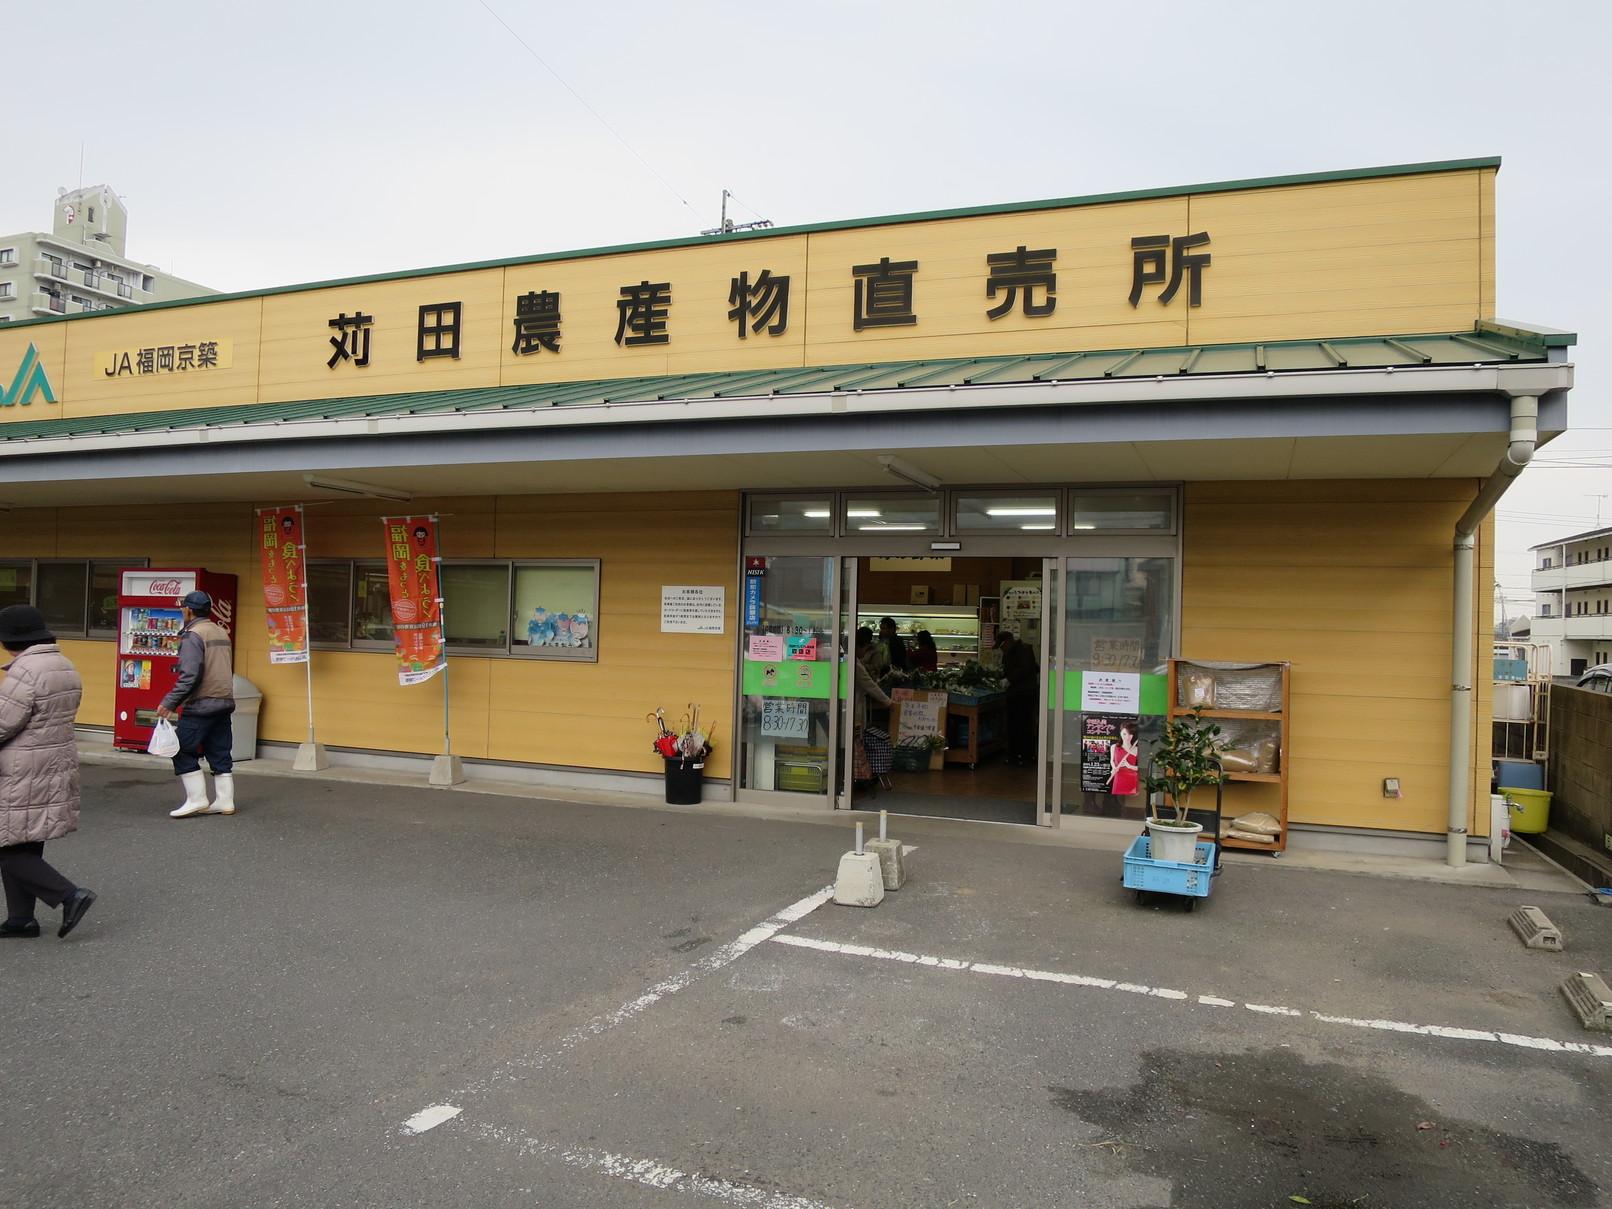 JA福岡京築 苅田農産物直売所